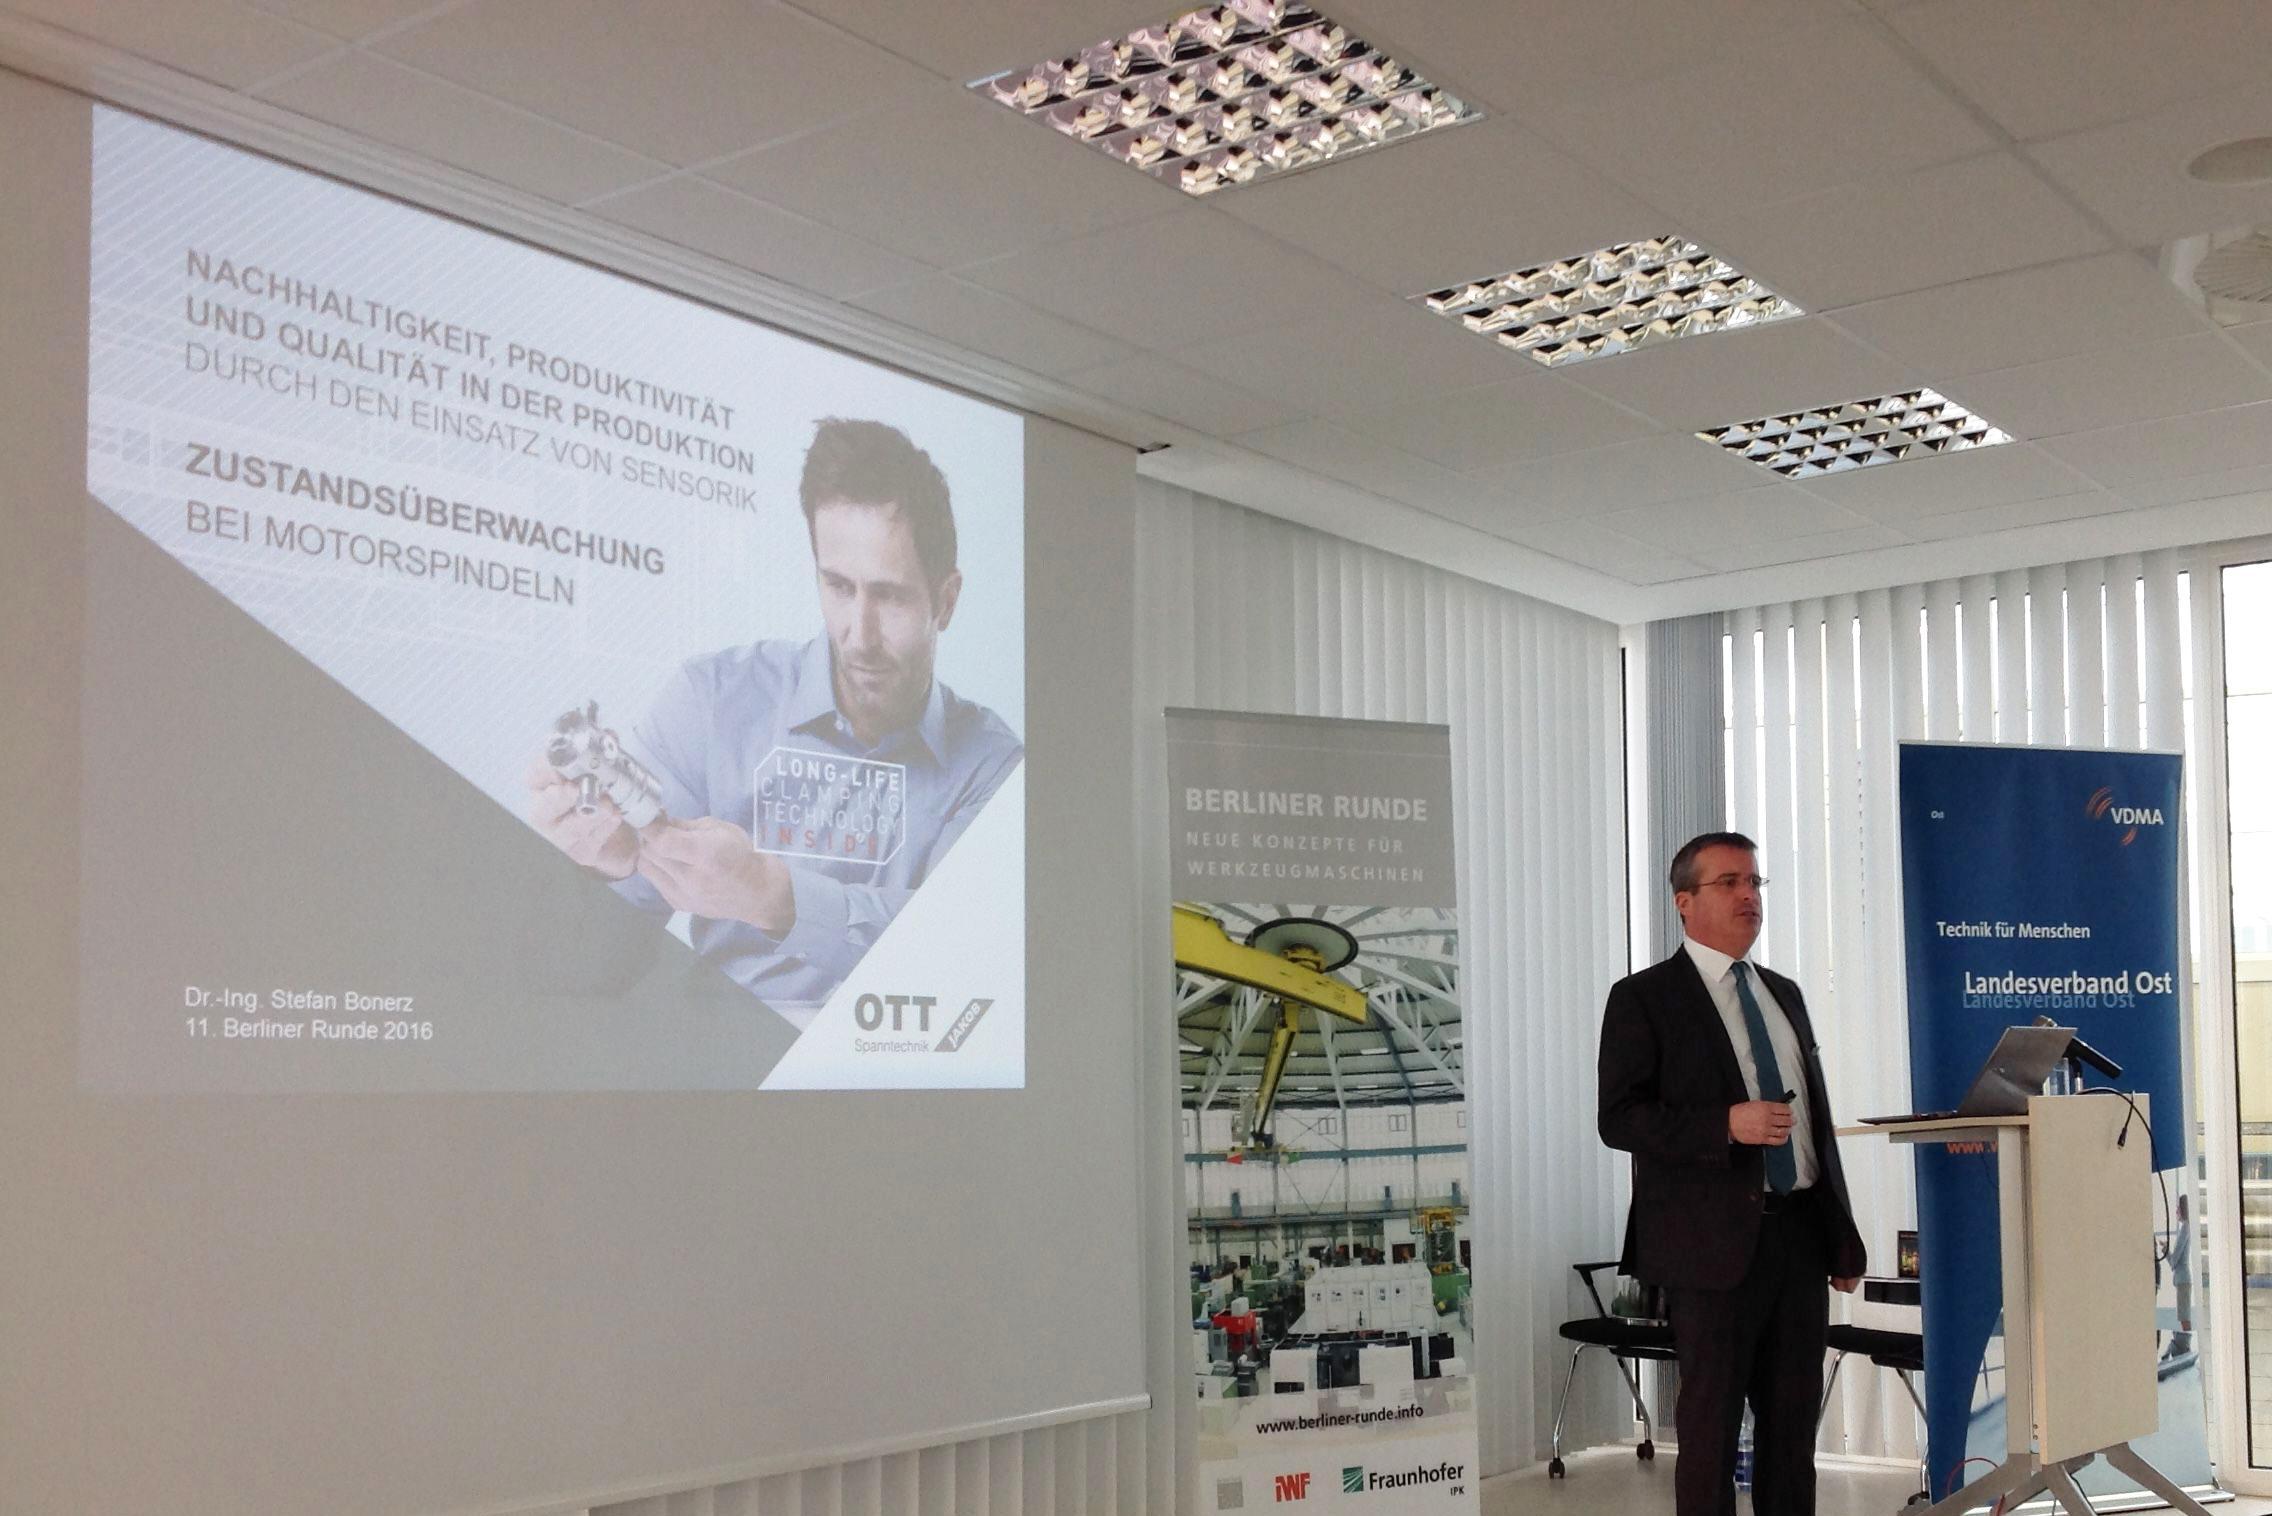 Ott Jakob - Unternehmen - Bild - OTT-JAKOB beteiligt sich an Berliner Runde 2016